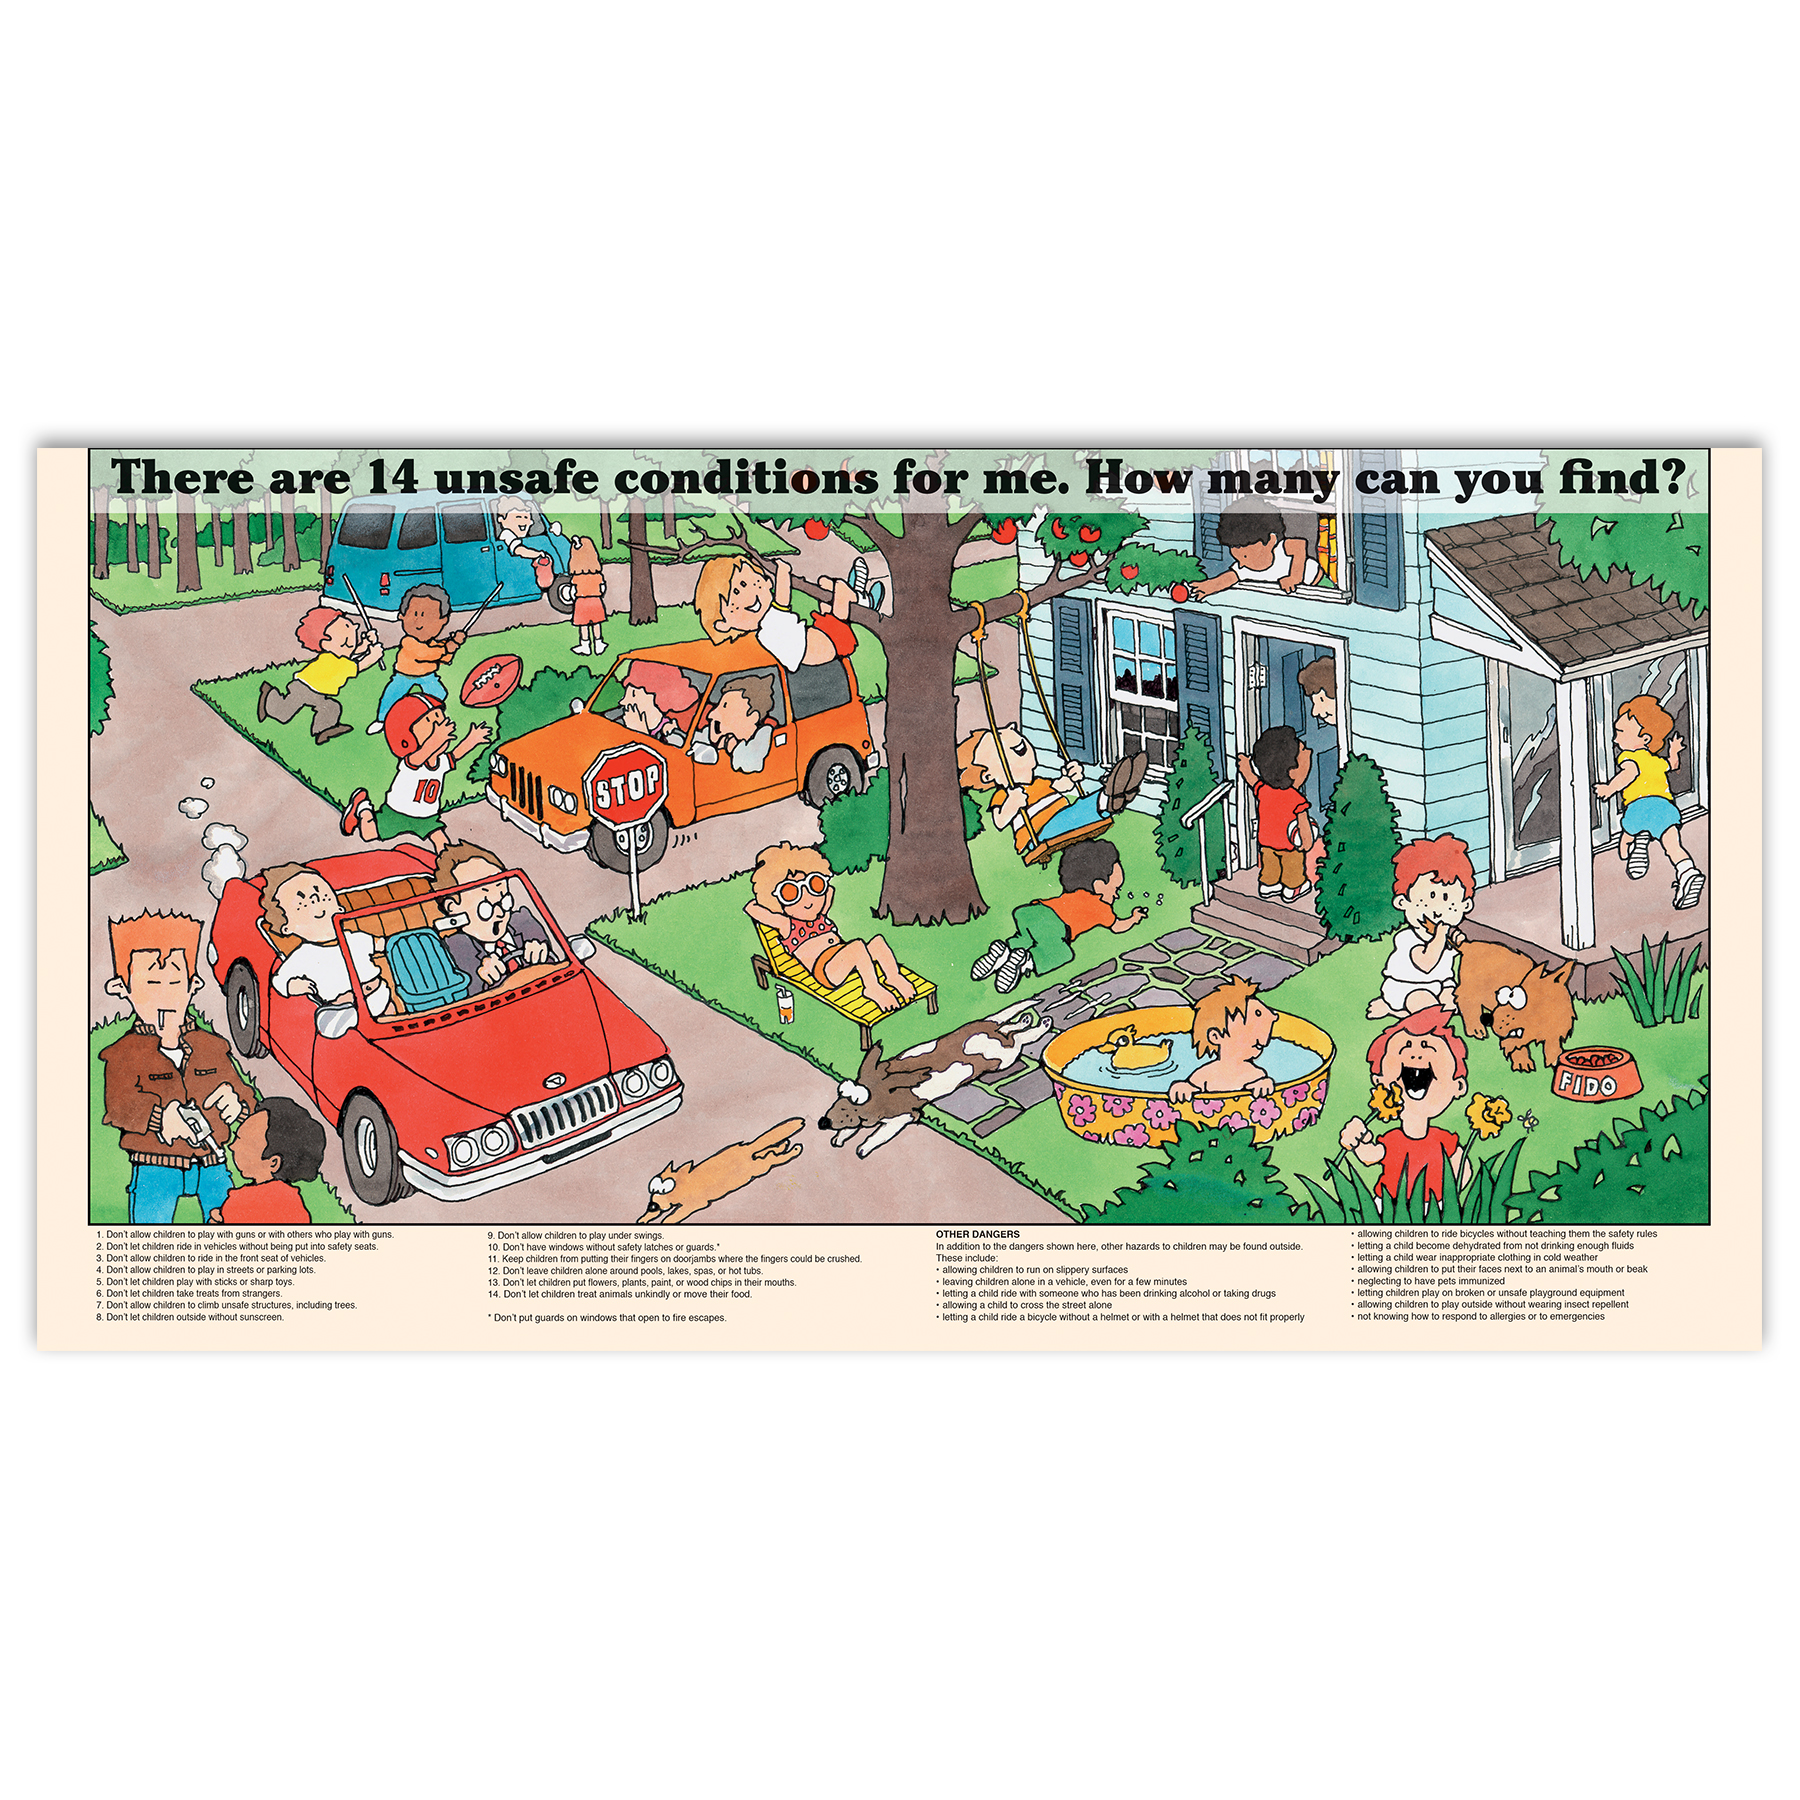 Mama make me safe pamphlet/poster inside pamphlet image, colorful cartoon illustrations depict unsafe situations for children, Childbirth Graphics, 38580